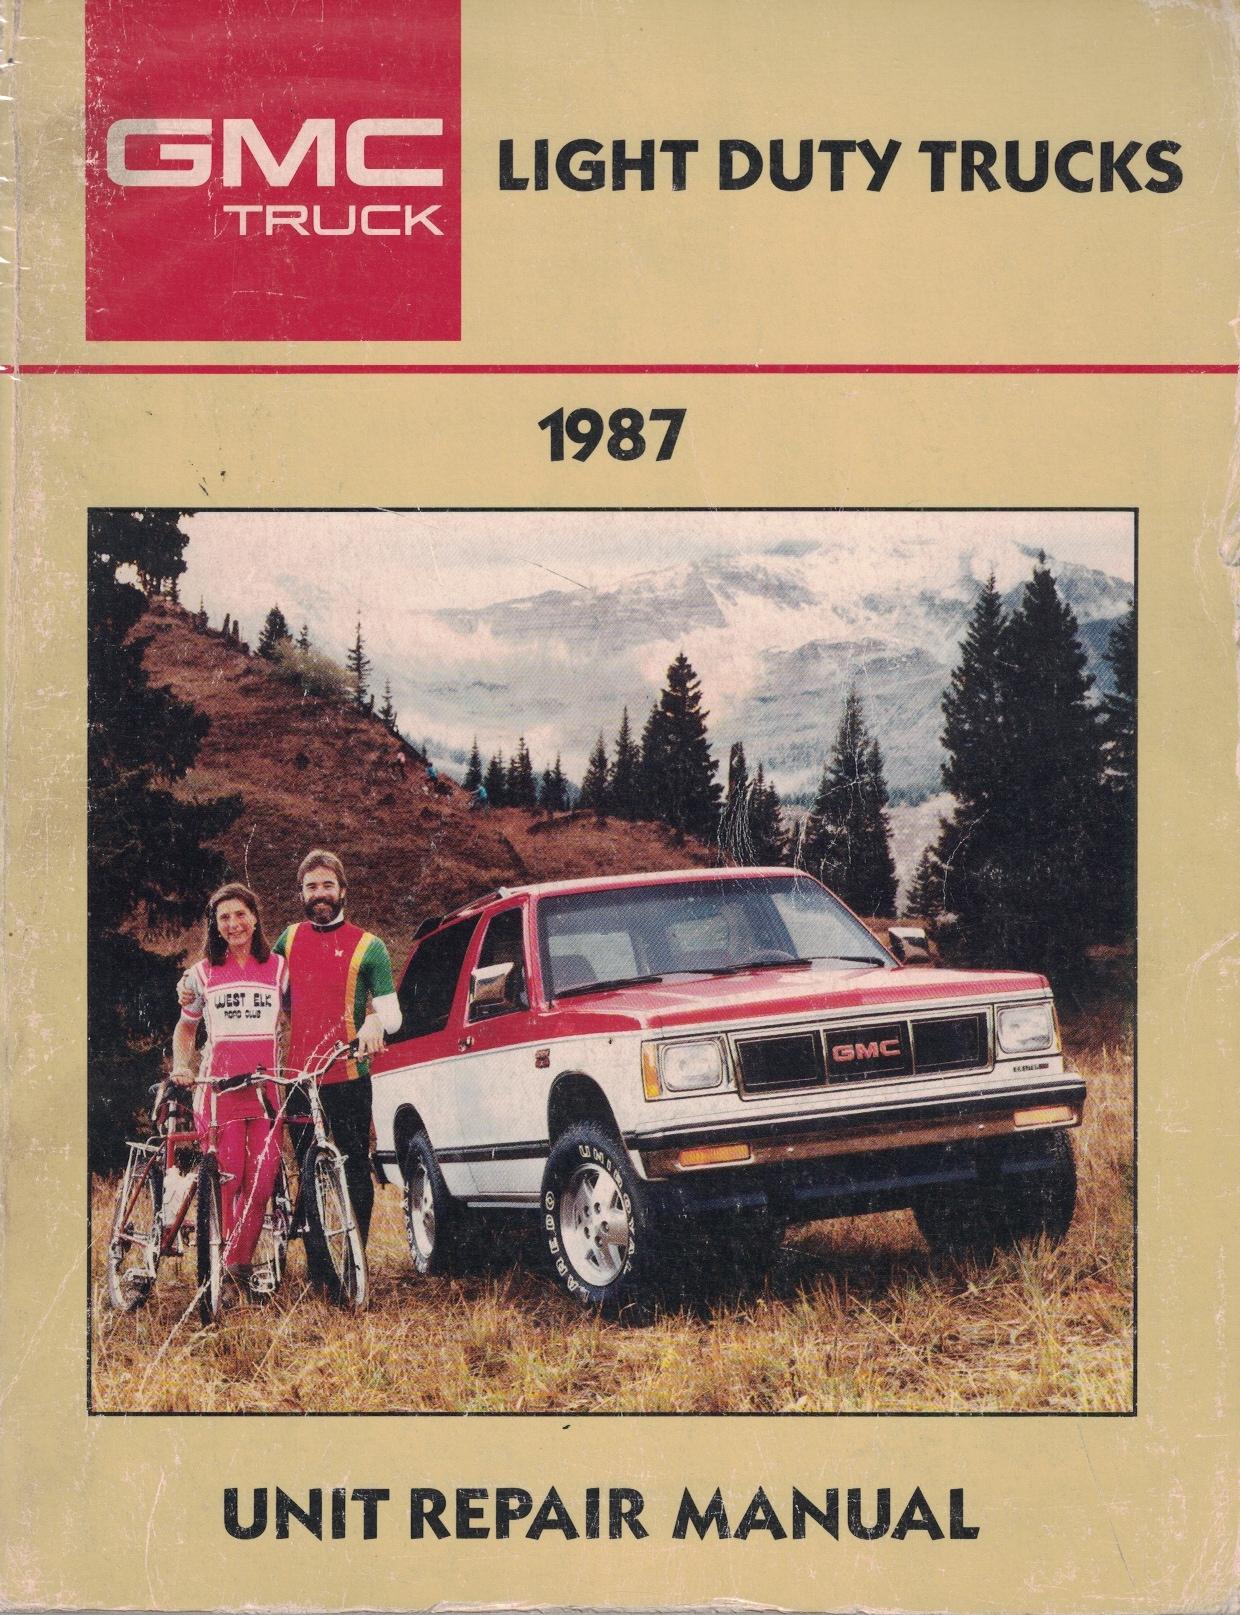 Image for 1987 Gmc Light Duty Truck Unit Repair Manual [original Service Manual]